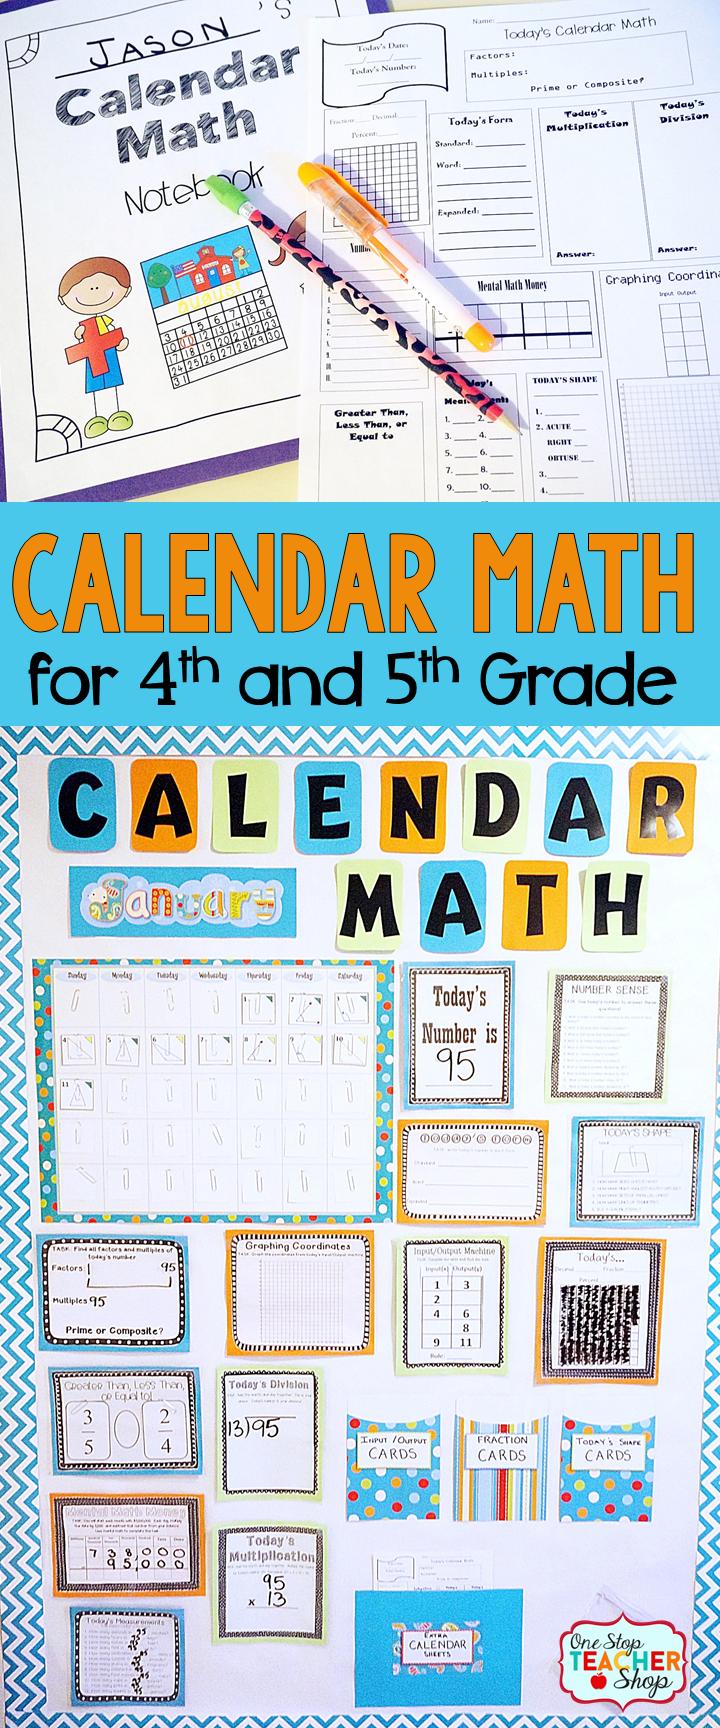 Calendar Math BUNDLE for Daily Math Review | Bulletin board, Math ...